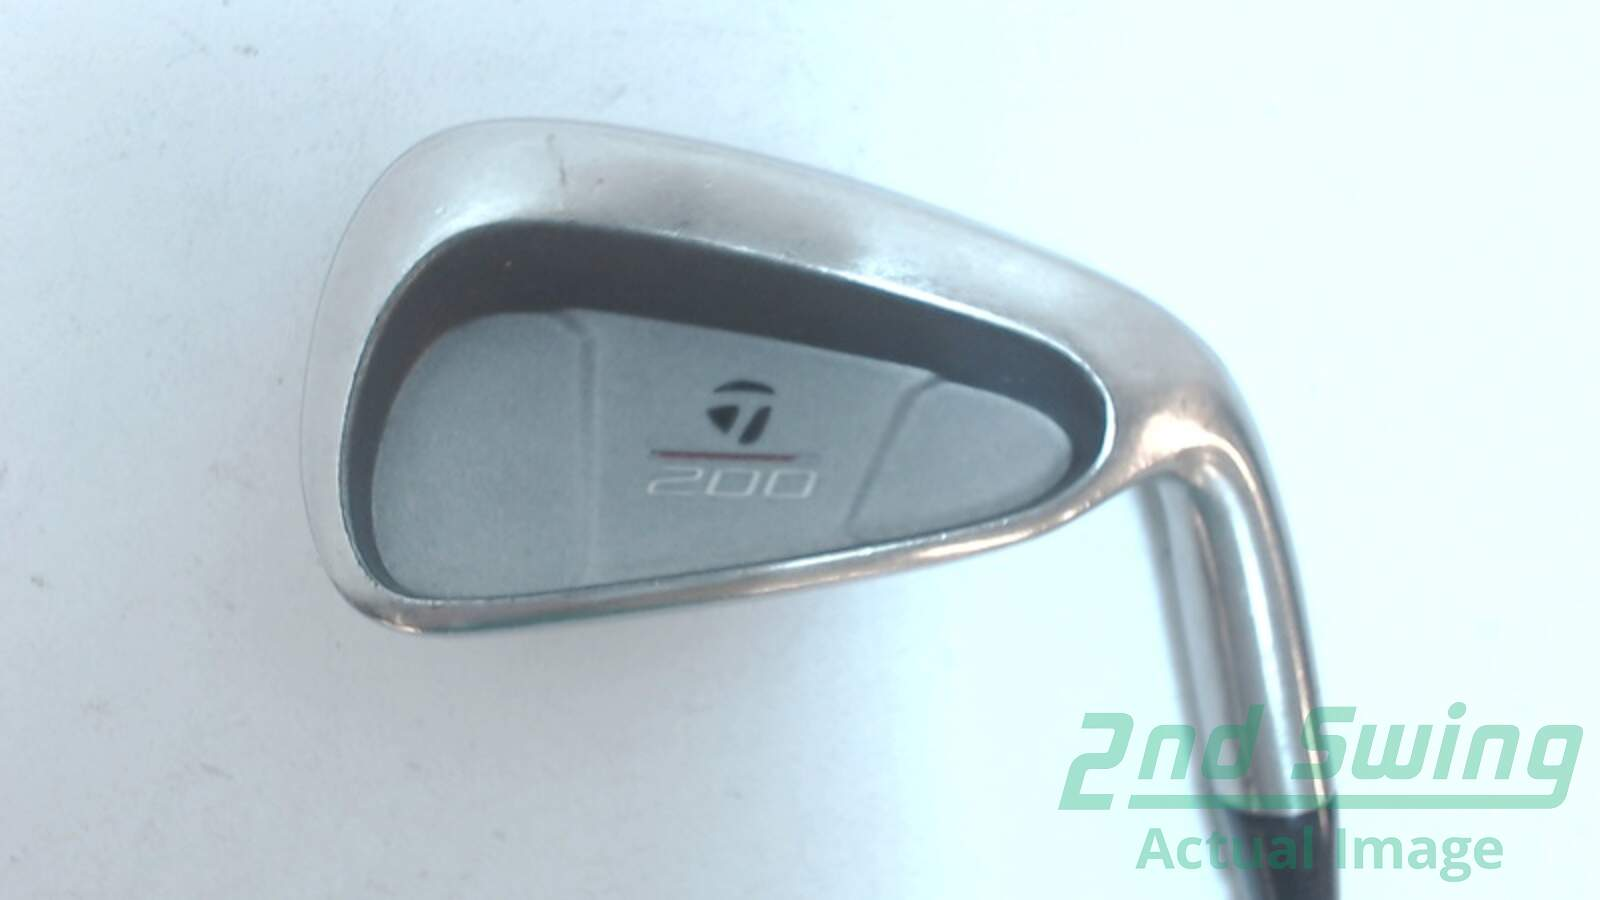 Used TaylorMade 200 Steel Single Iron 4 Iron Graphite Regular Right ...